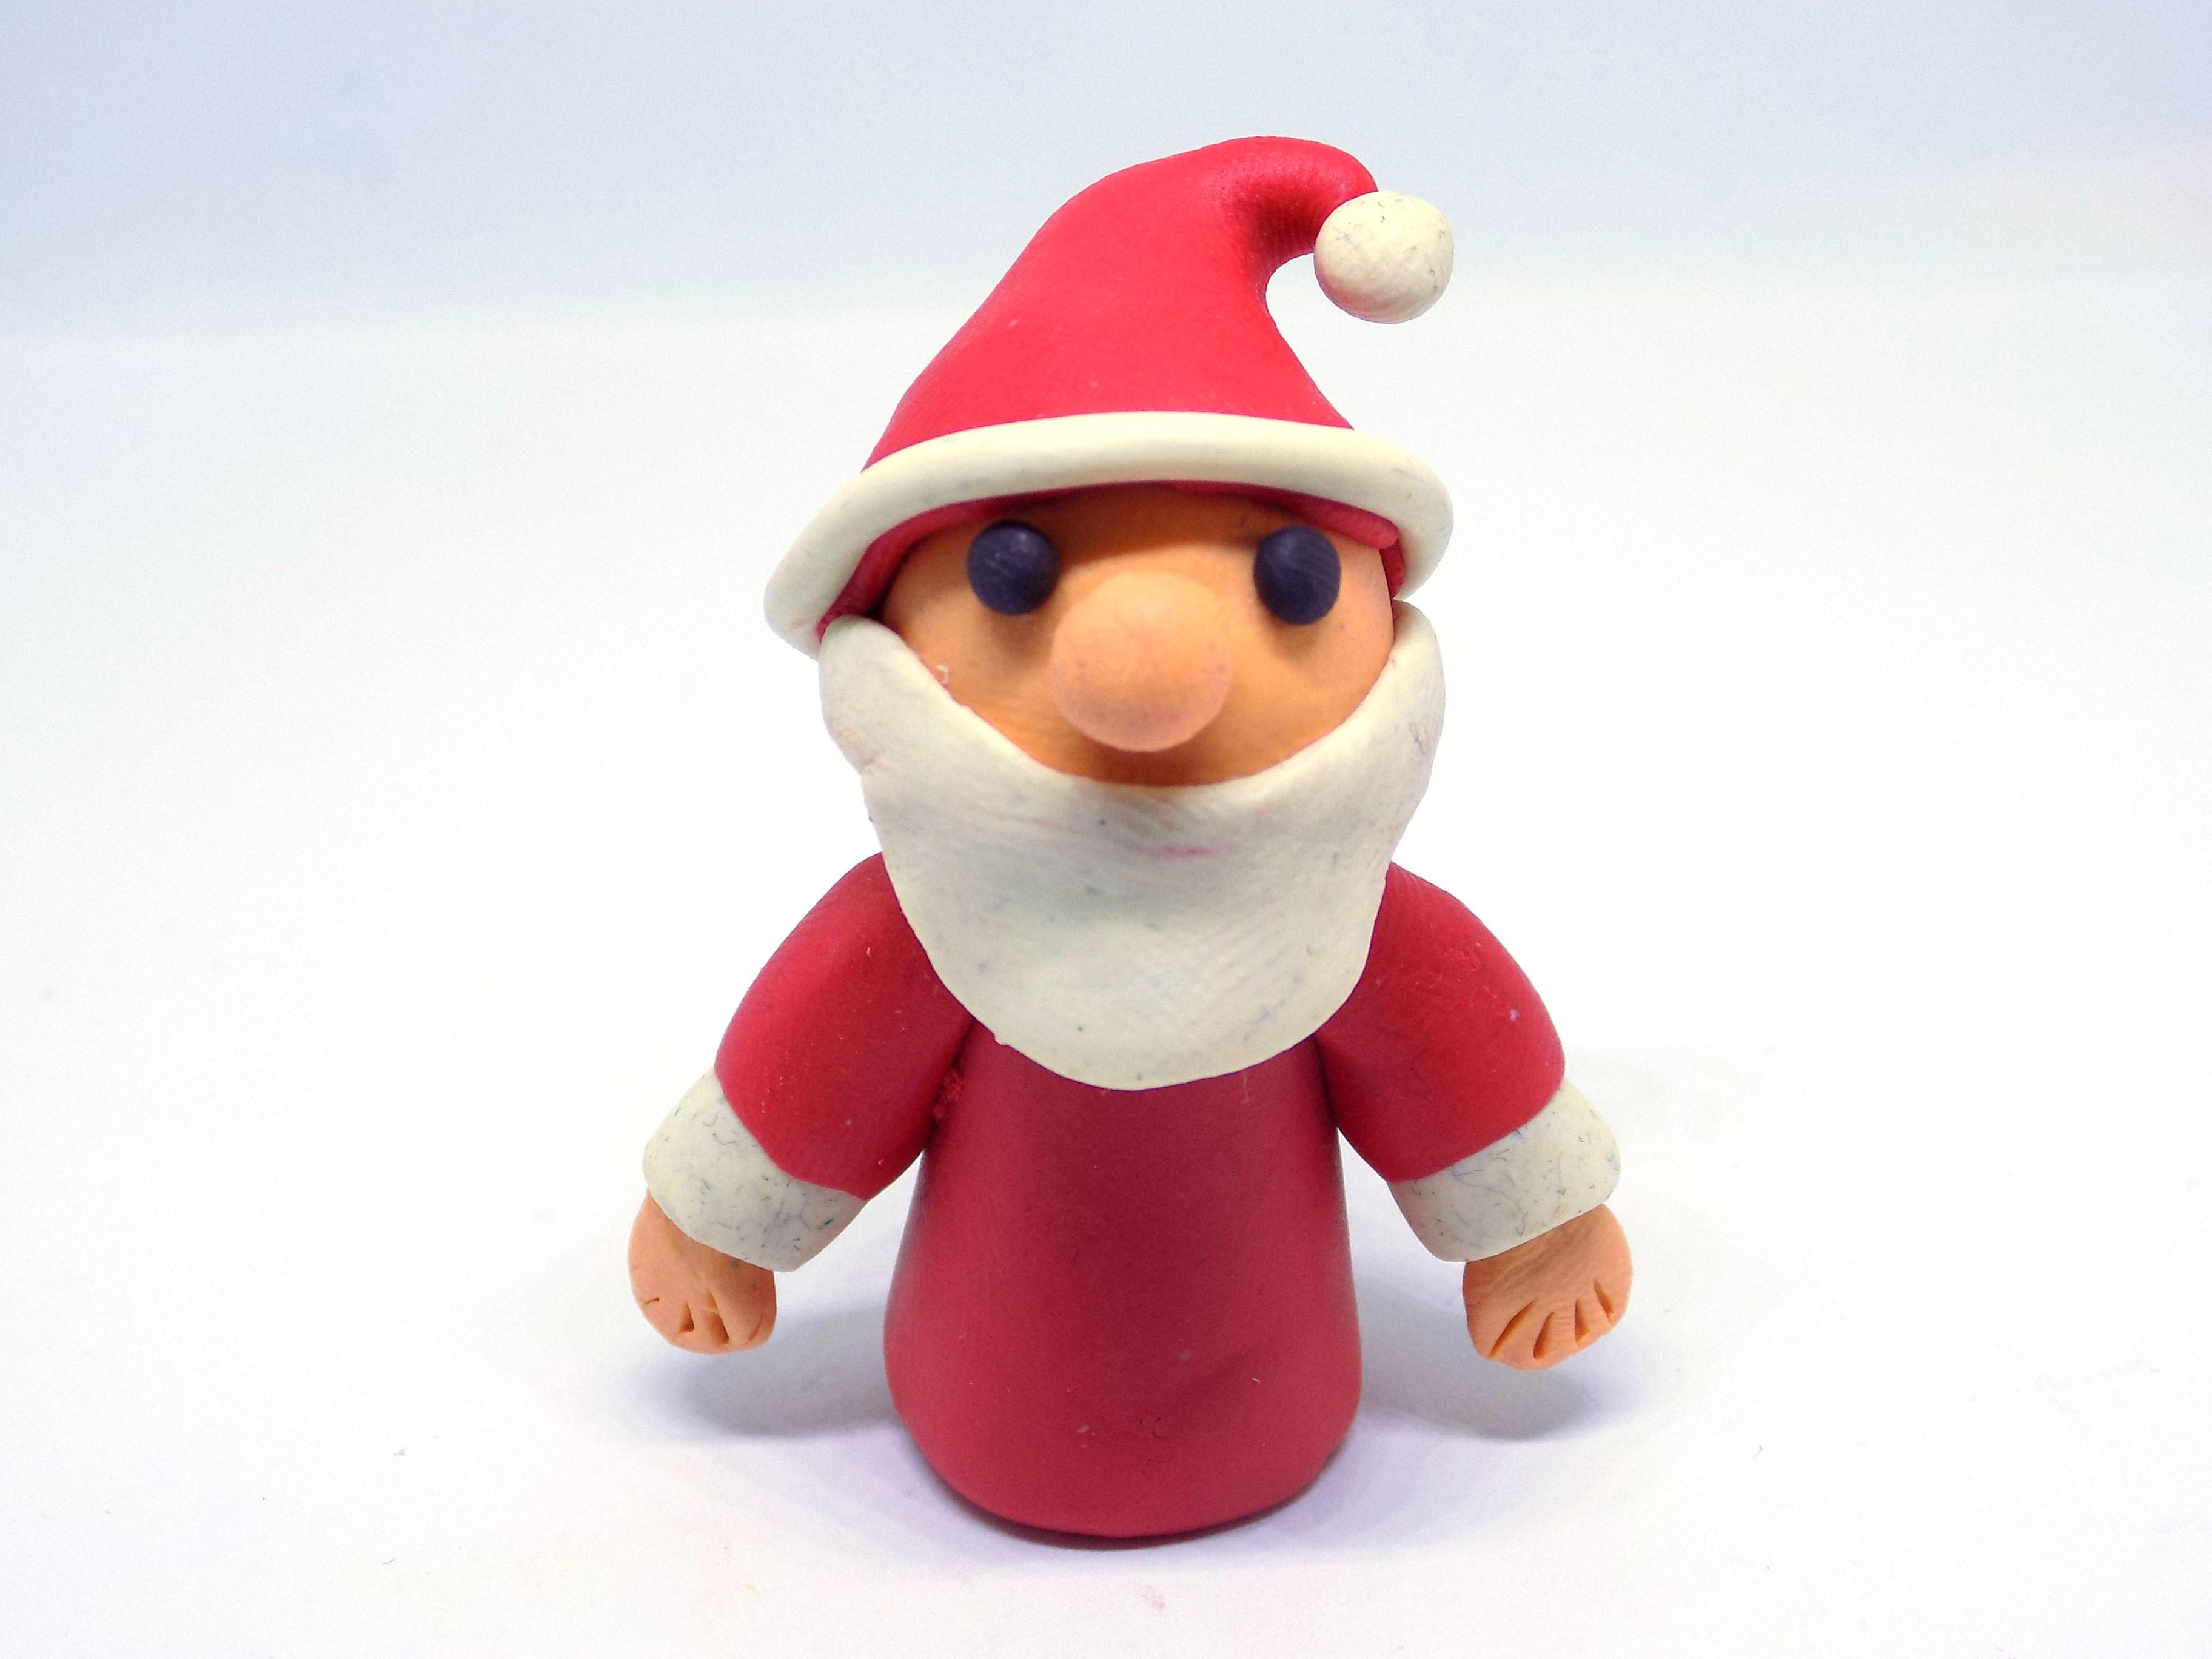 Санта Клауса из пластилина. Новогодняя поделка